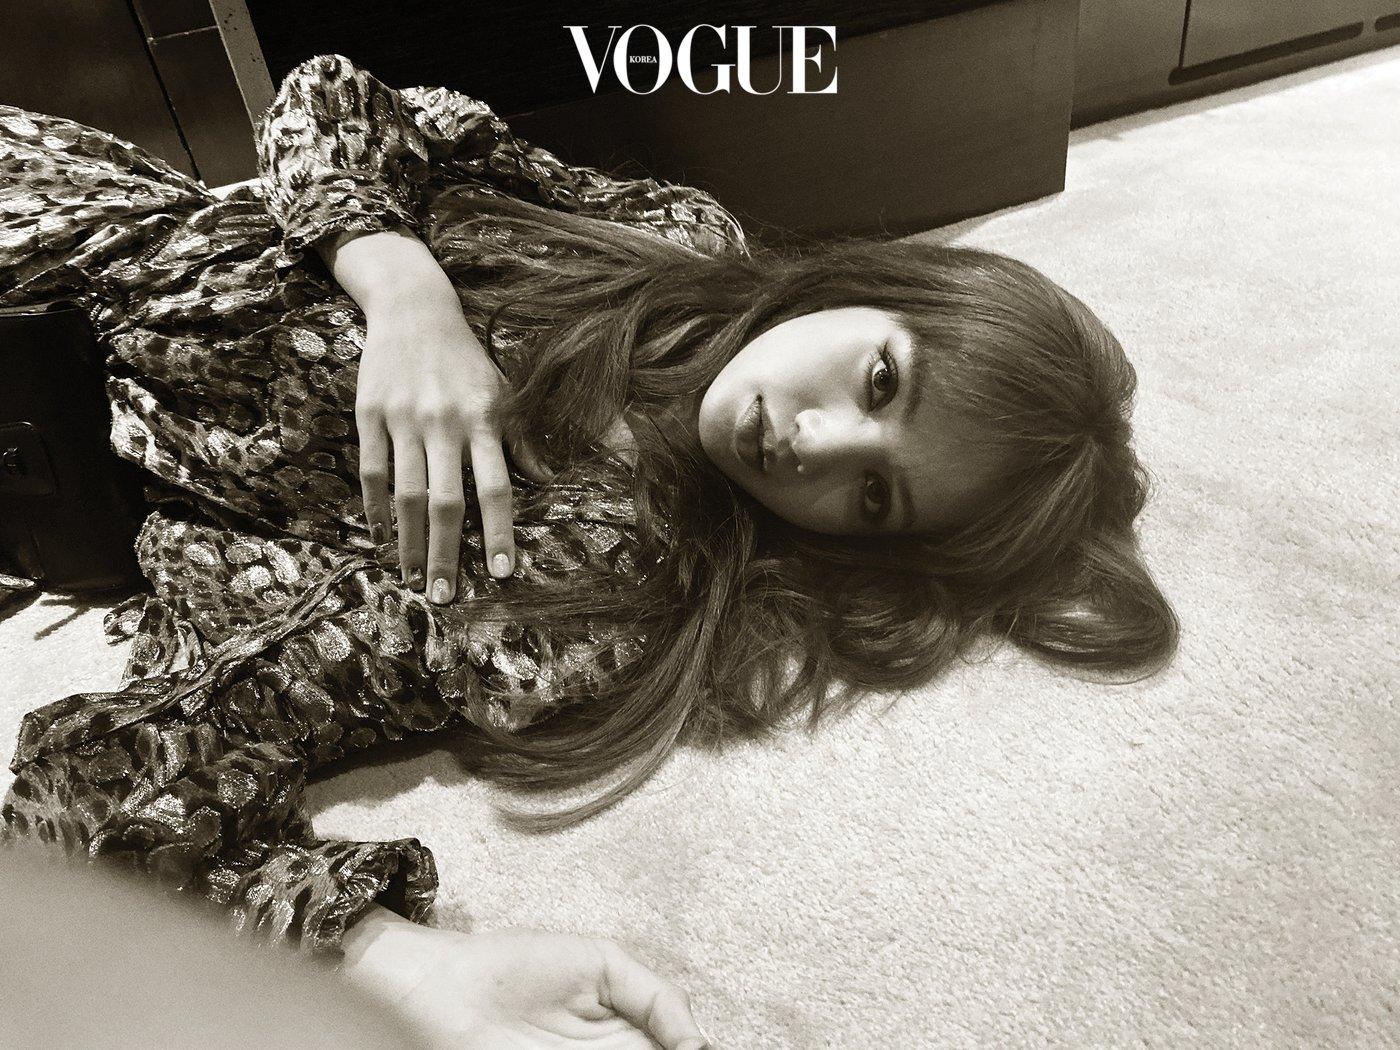 BLACKPINK的Lisa在《Vogue》韩国版上野狂野美女